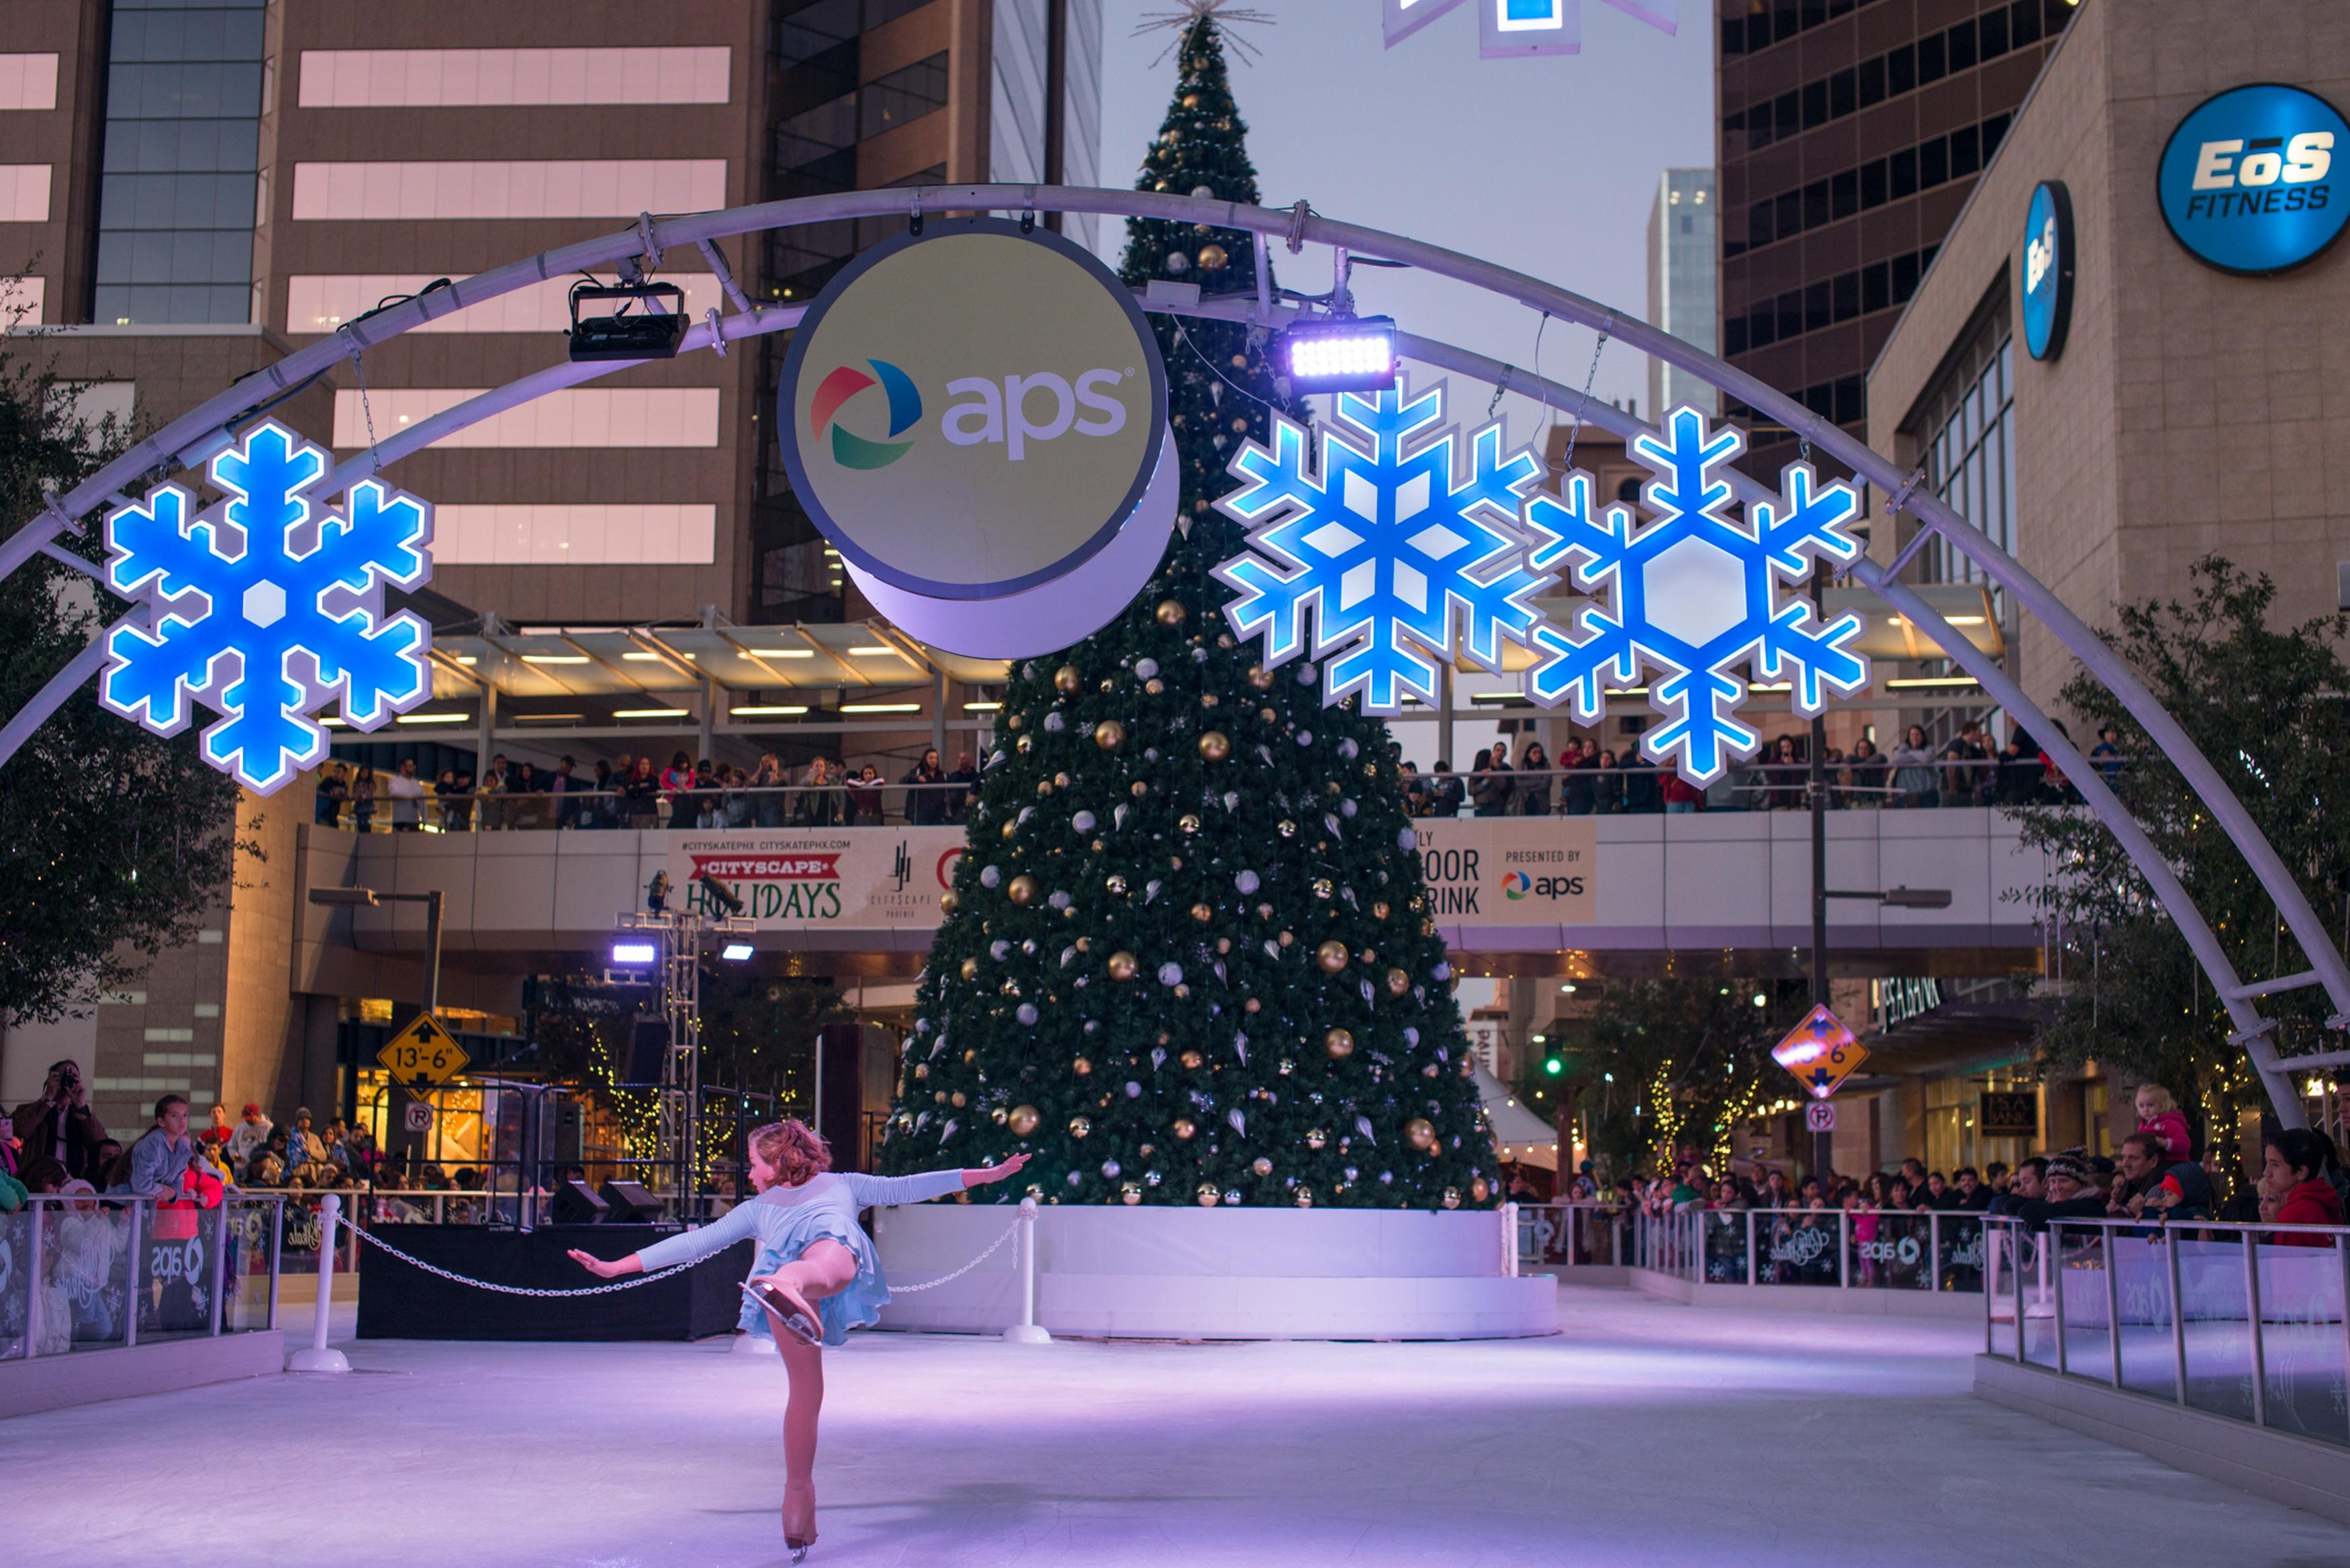 Christmas Ice Skating Rink Decoration.Cityskate Holiday Ice Rink